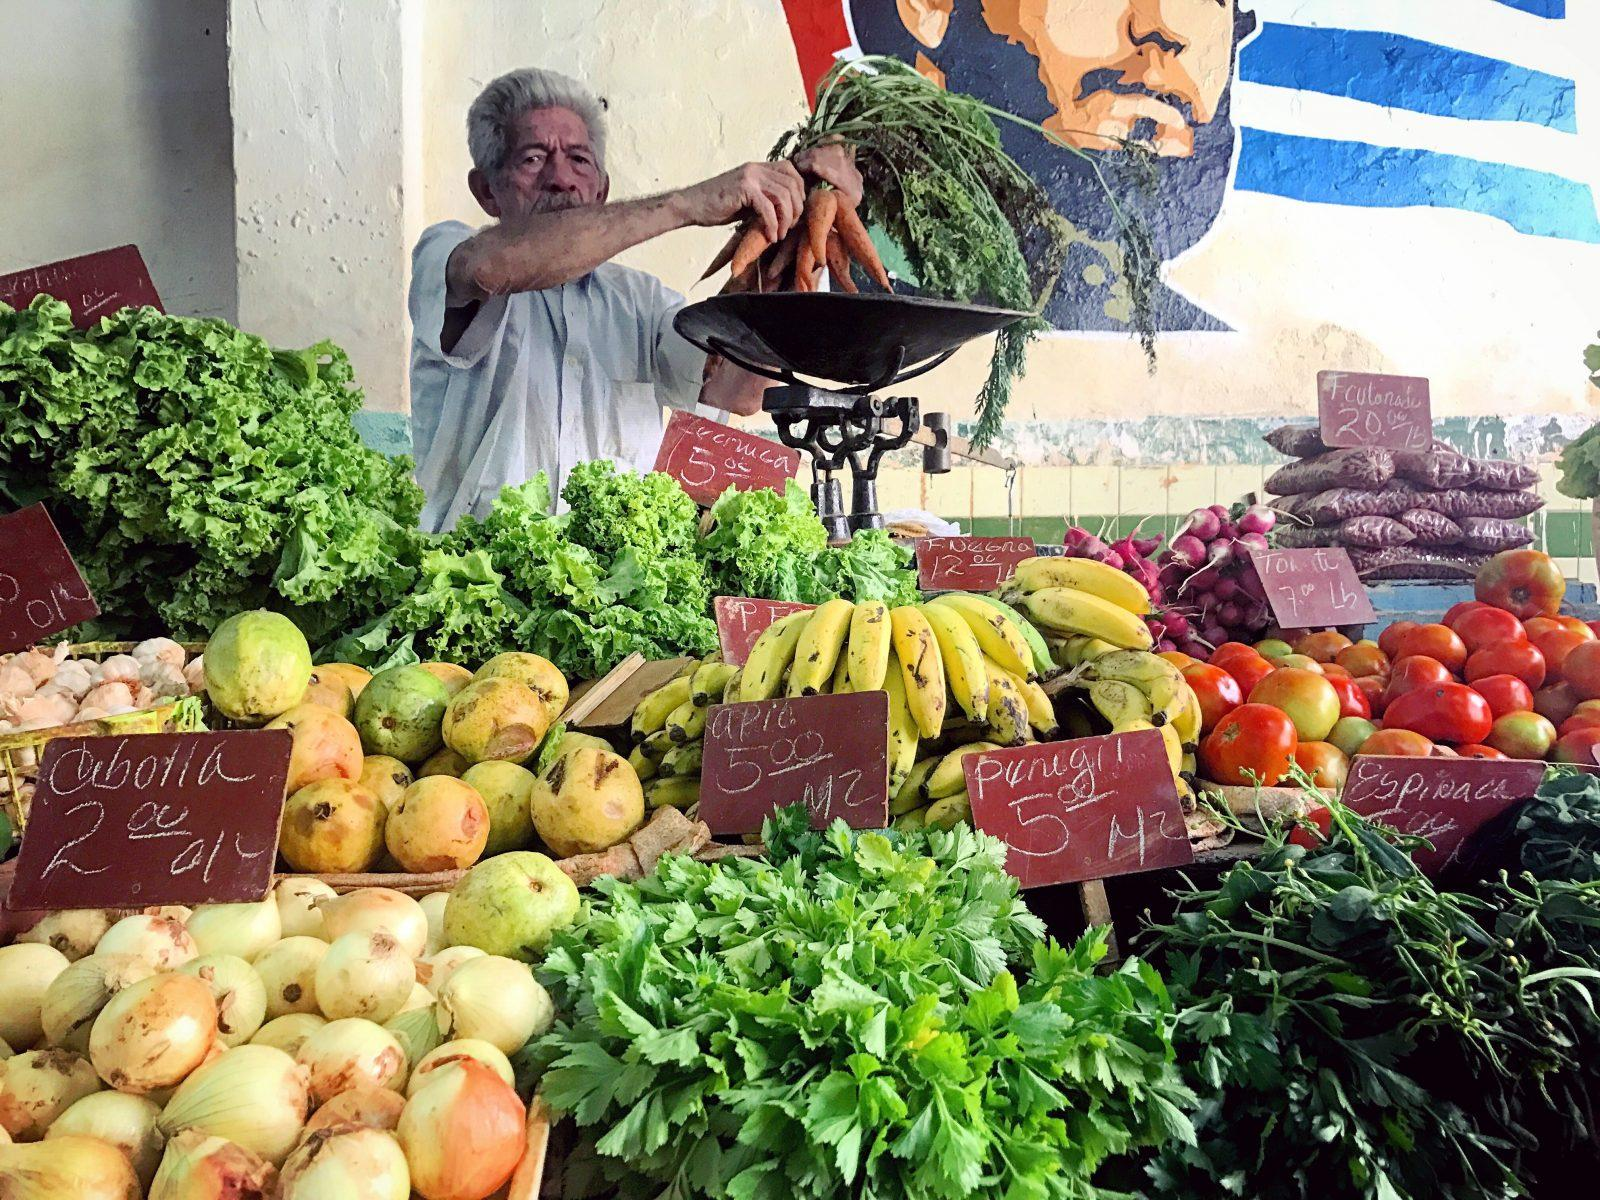 Fruits and Veggies Market Havana Cuba